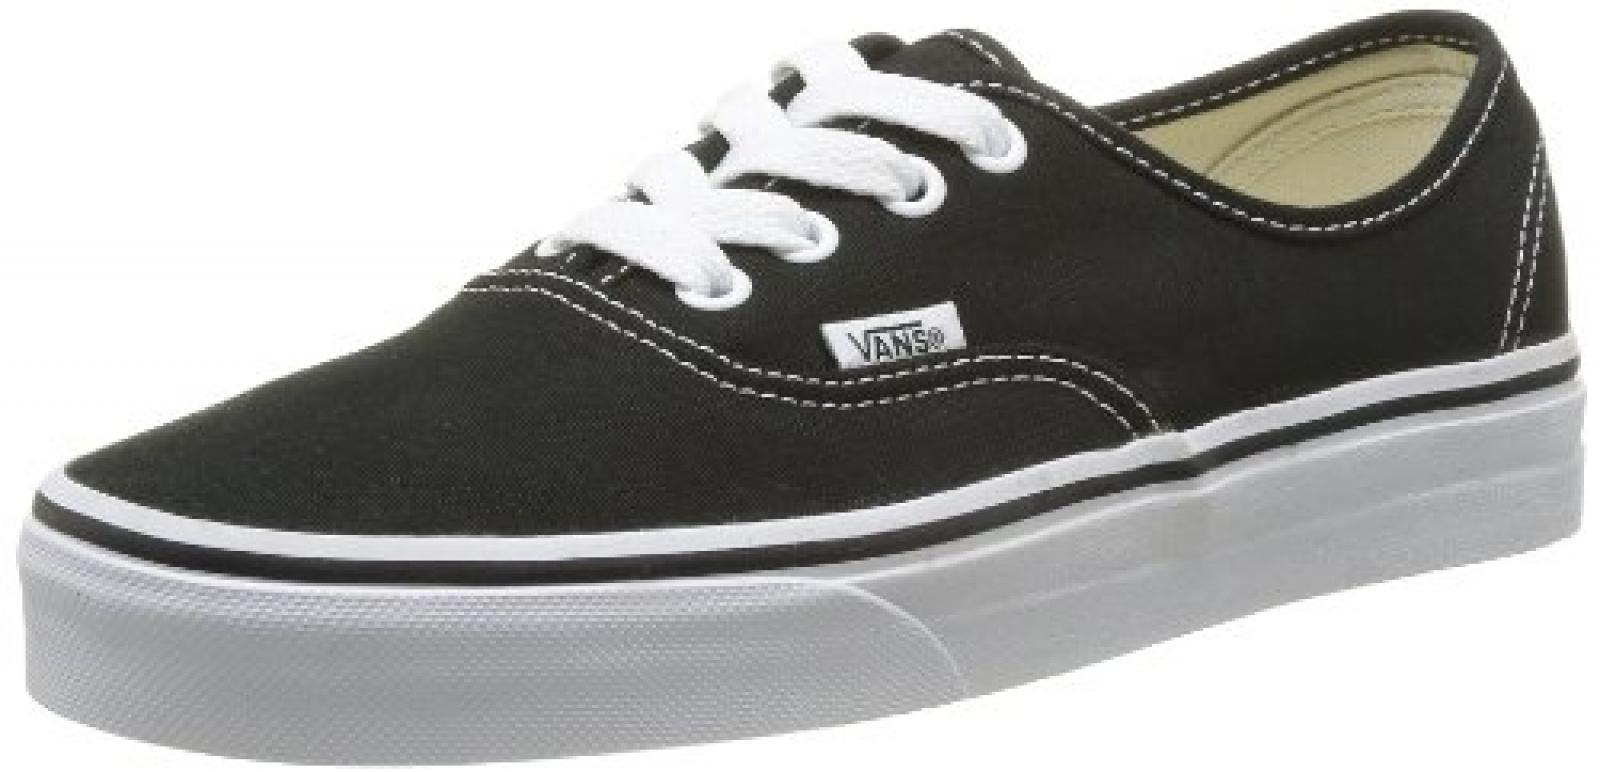 Vans Authentic Unisex-Erwachsene Sneakers